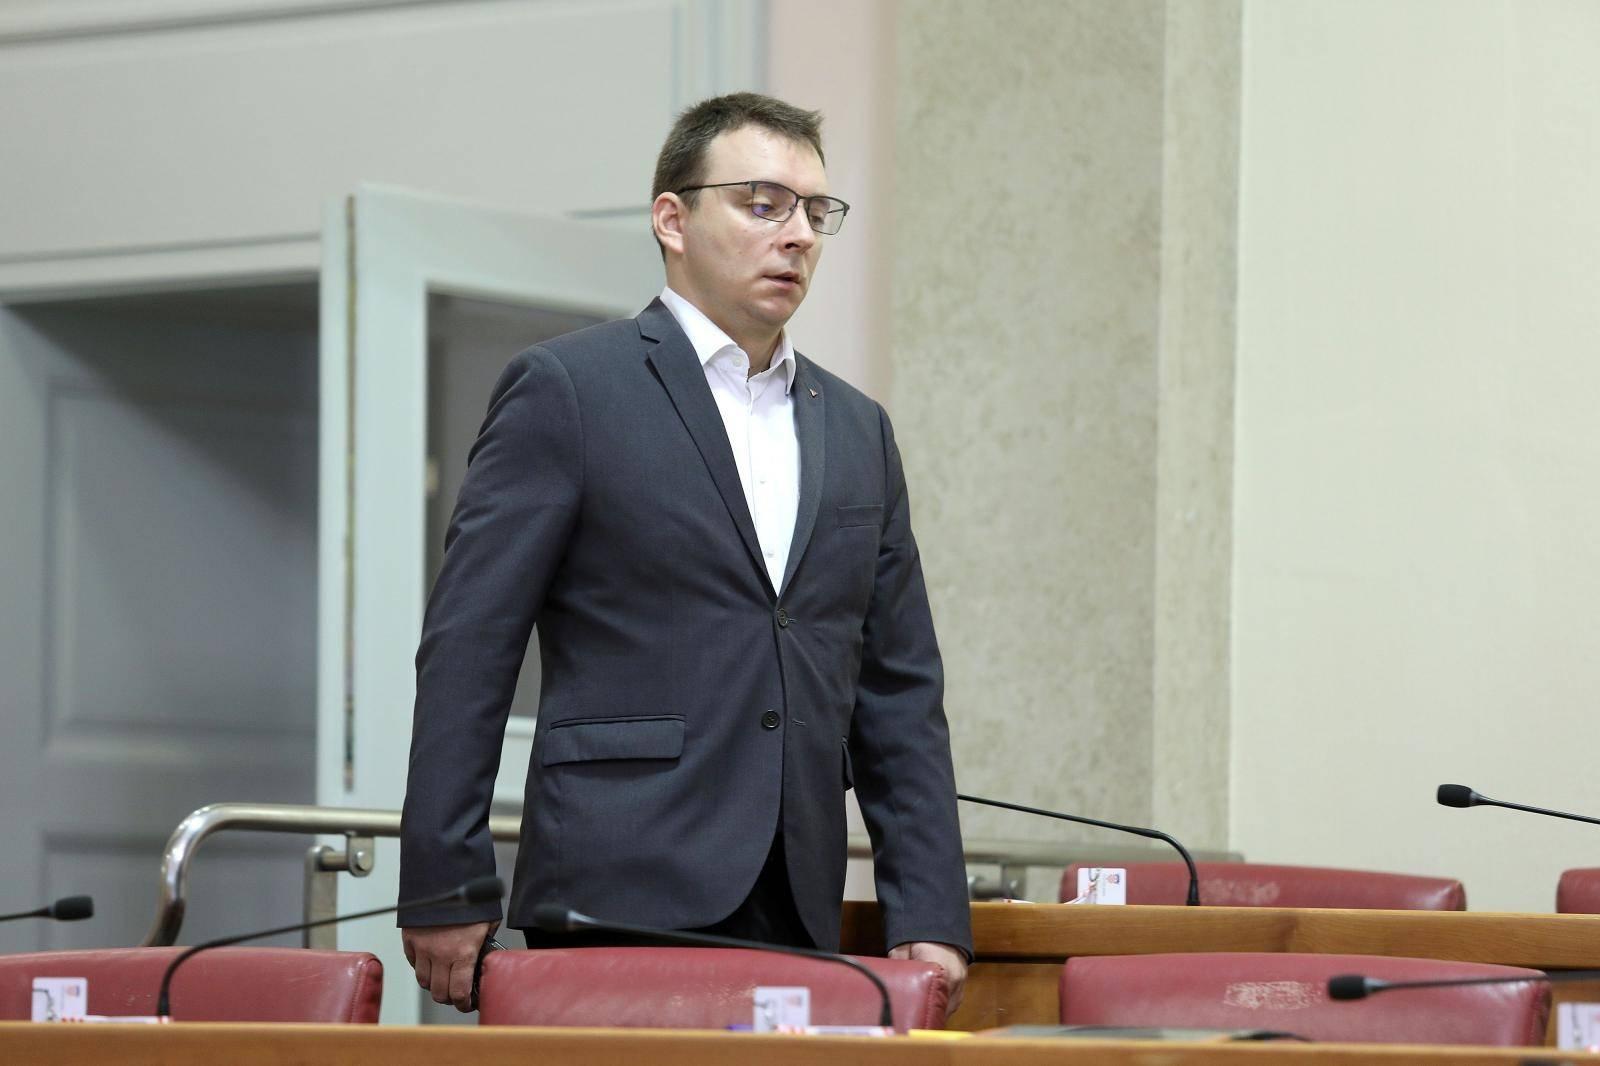 'Penavi je Vukovar instrument u ambiciji da bude šef HDZ-a'